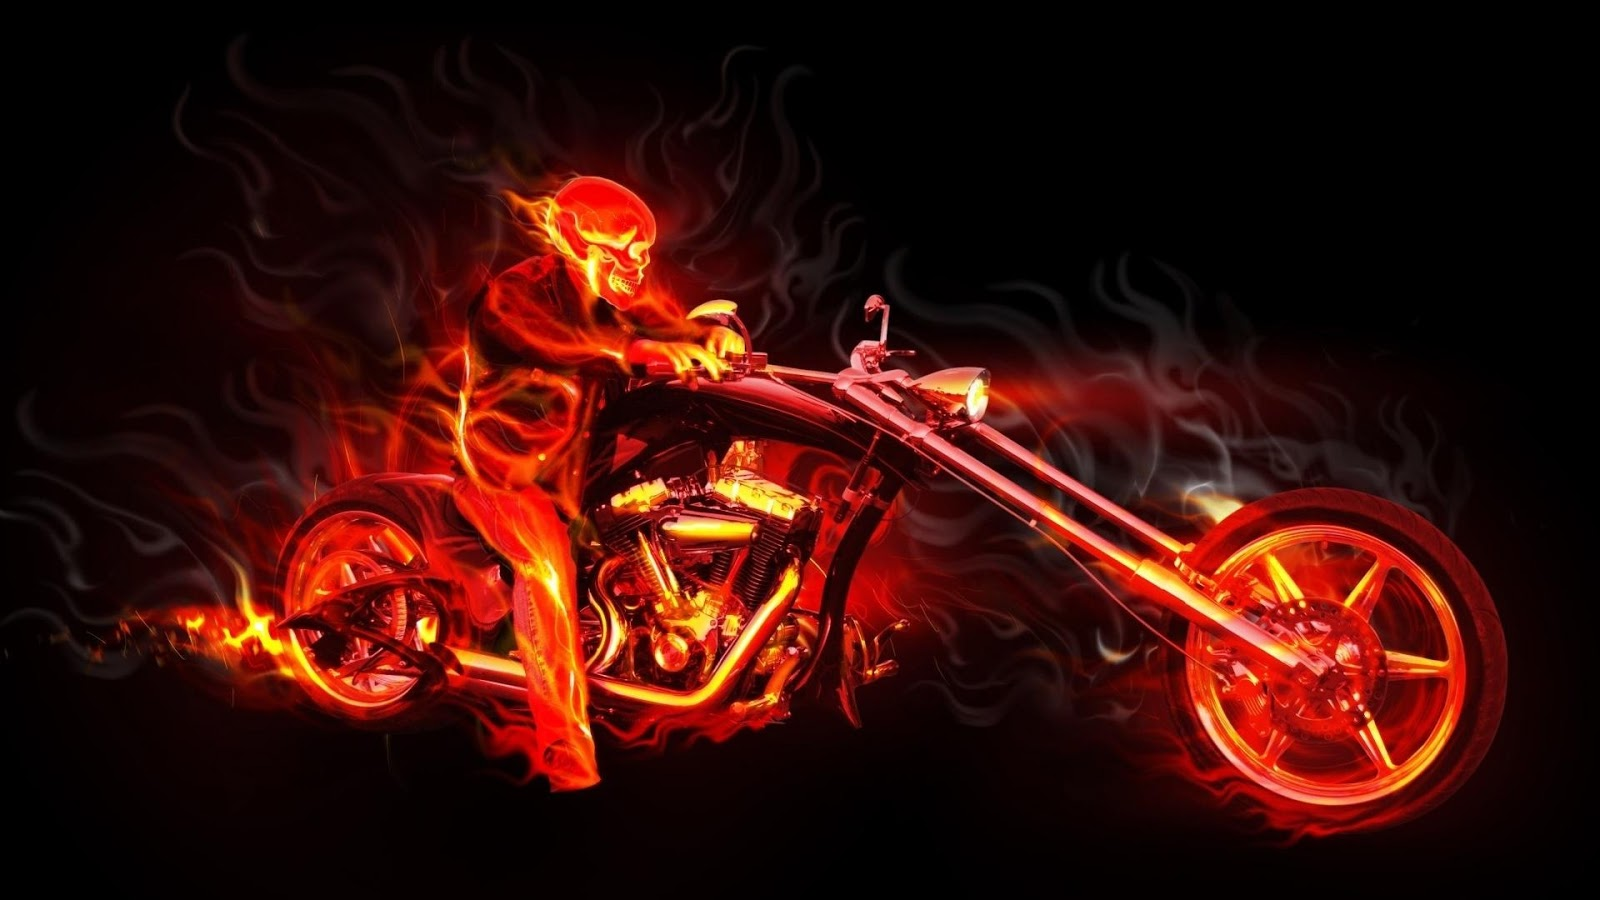 Motorcycle Skull Flames Fantasy Wallpaper Hd 6474 Wallpaper 1600x900